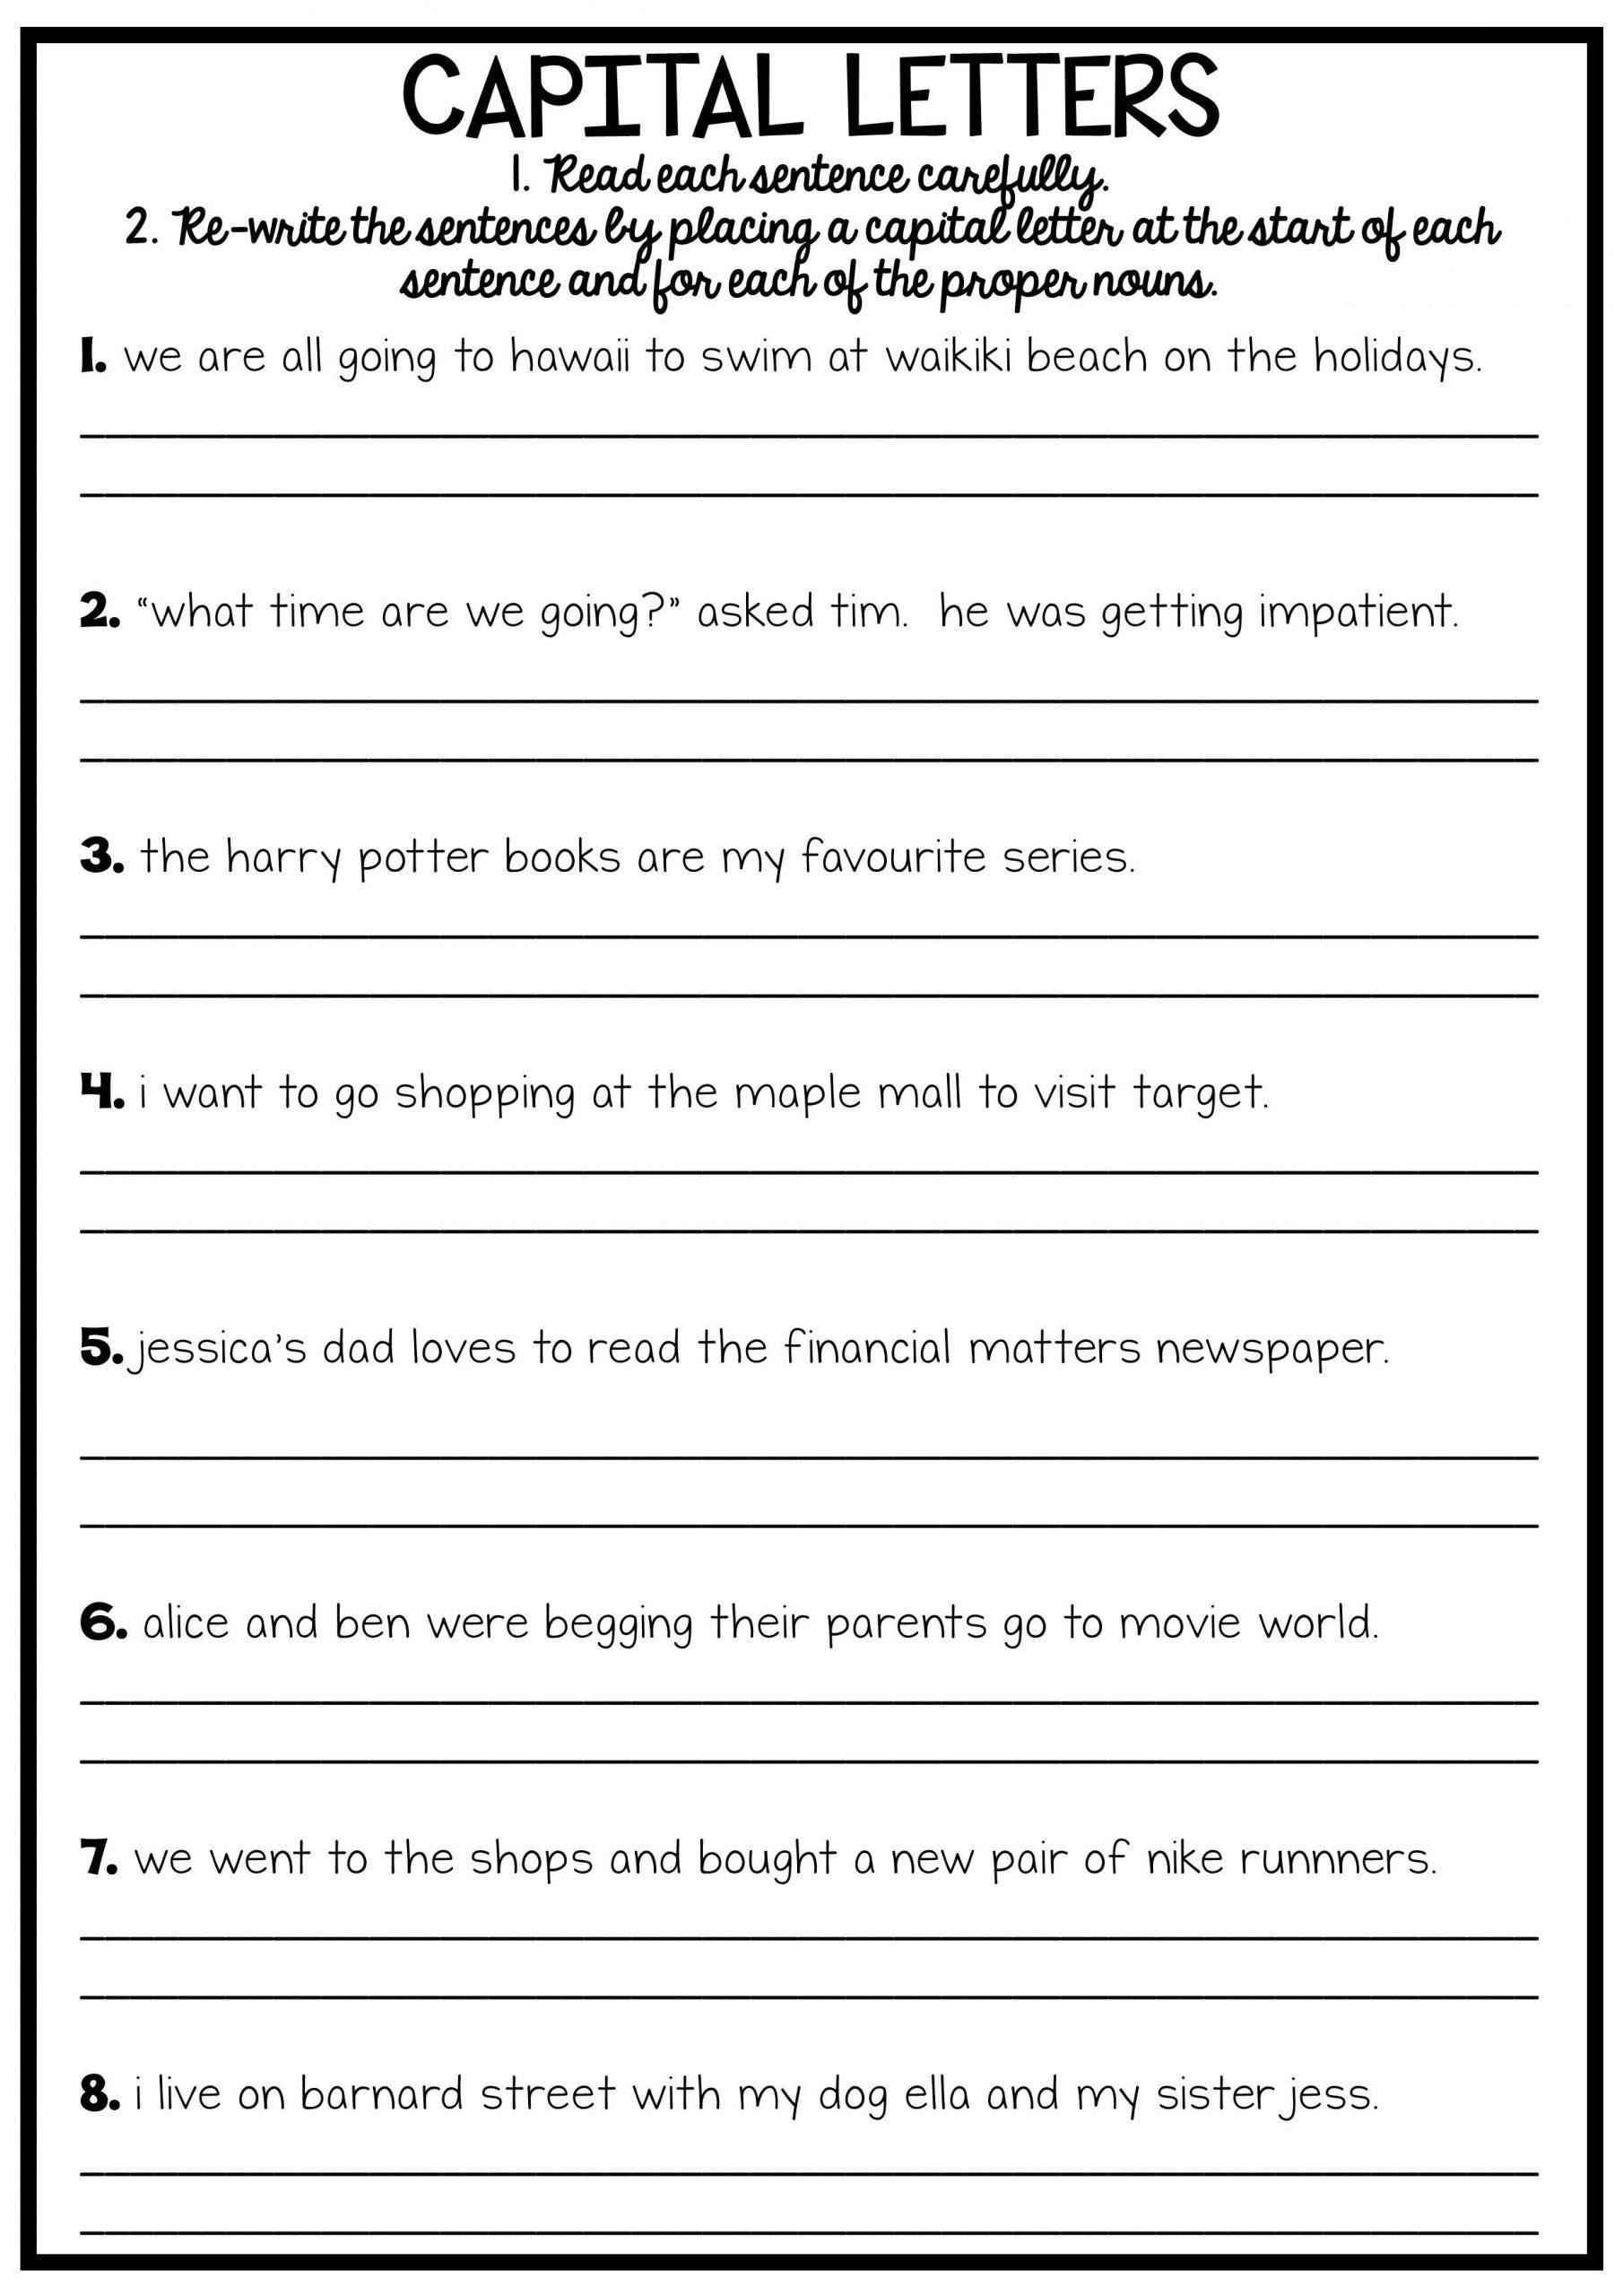 Proper Nouns Worksheet 2nd Grade 5th Grade English Worksheets Nouns